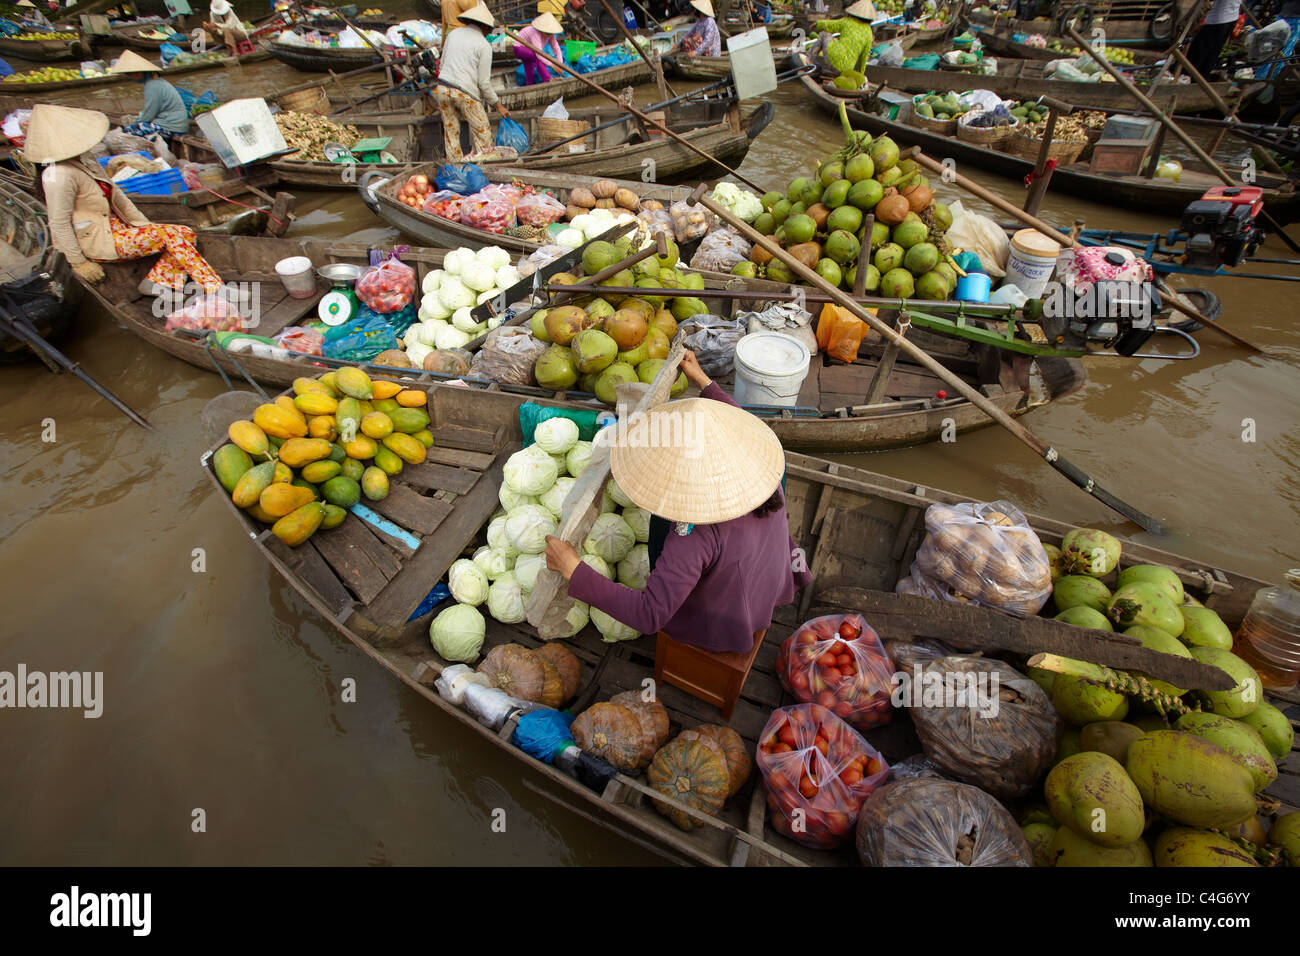 El mercado flotante nr Can Tho, en el Delta del Mekong, Vietnam Imagen De Stock